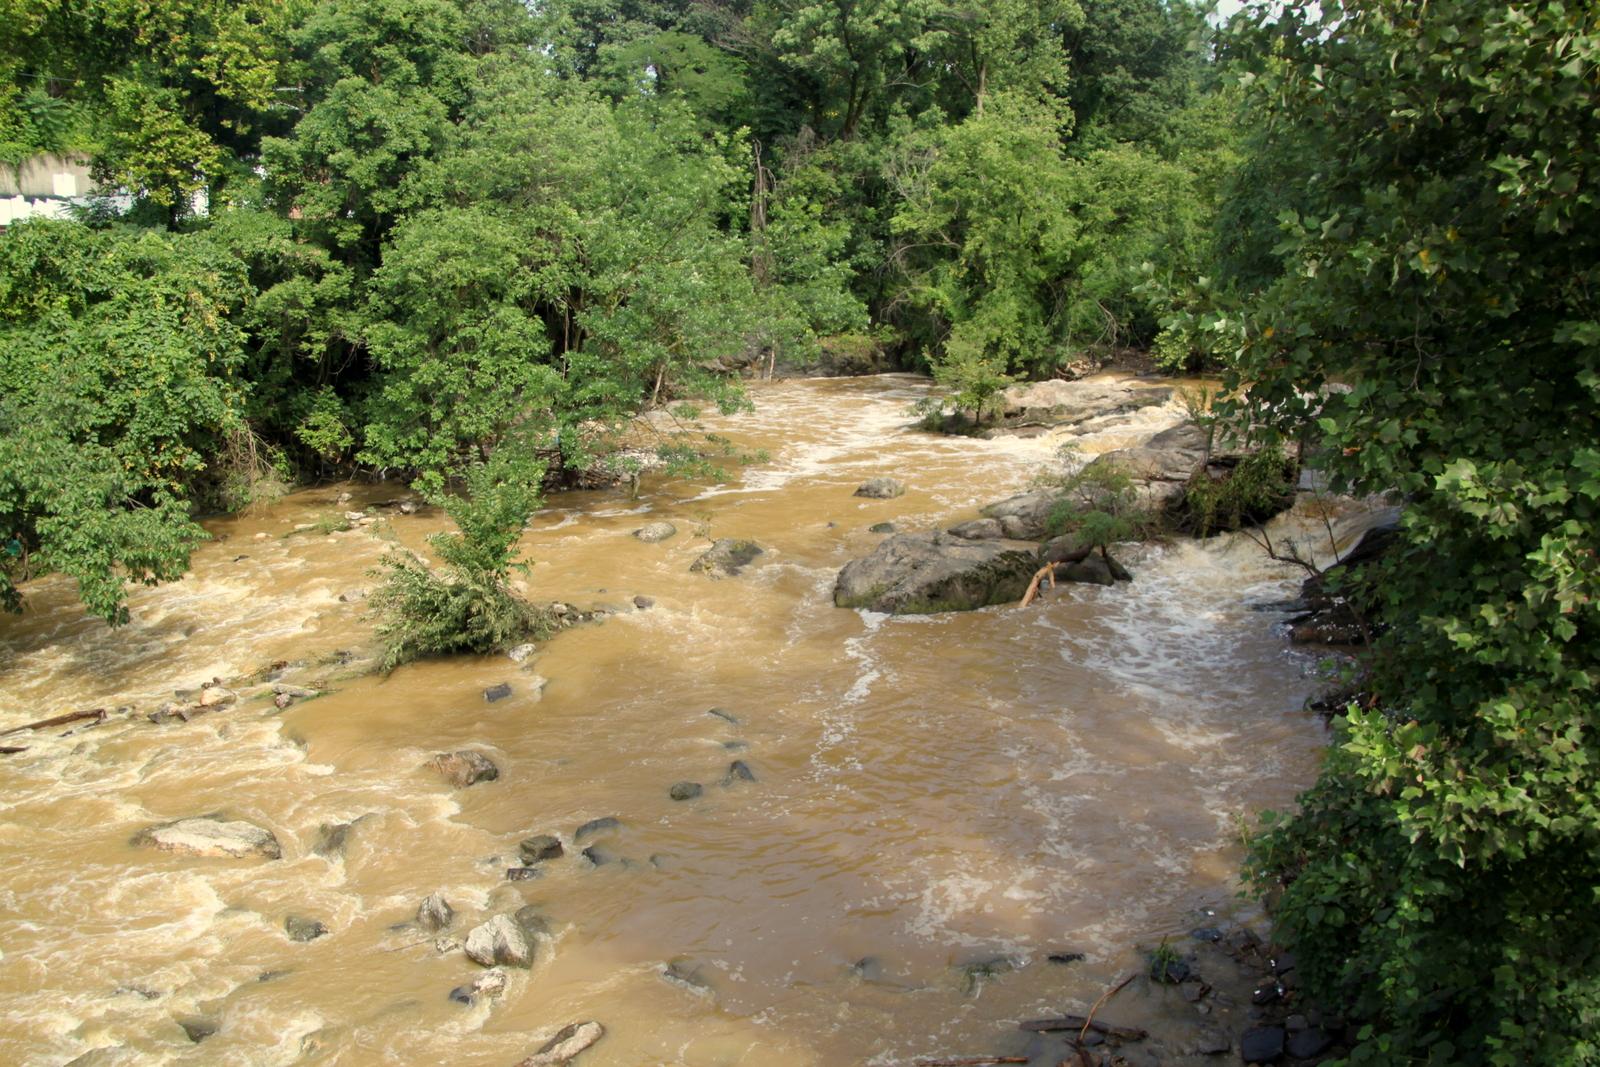 The Jones Falls on Sunday morning, following severe rainstorm Saturday night. (Fern Shen)